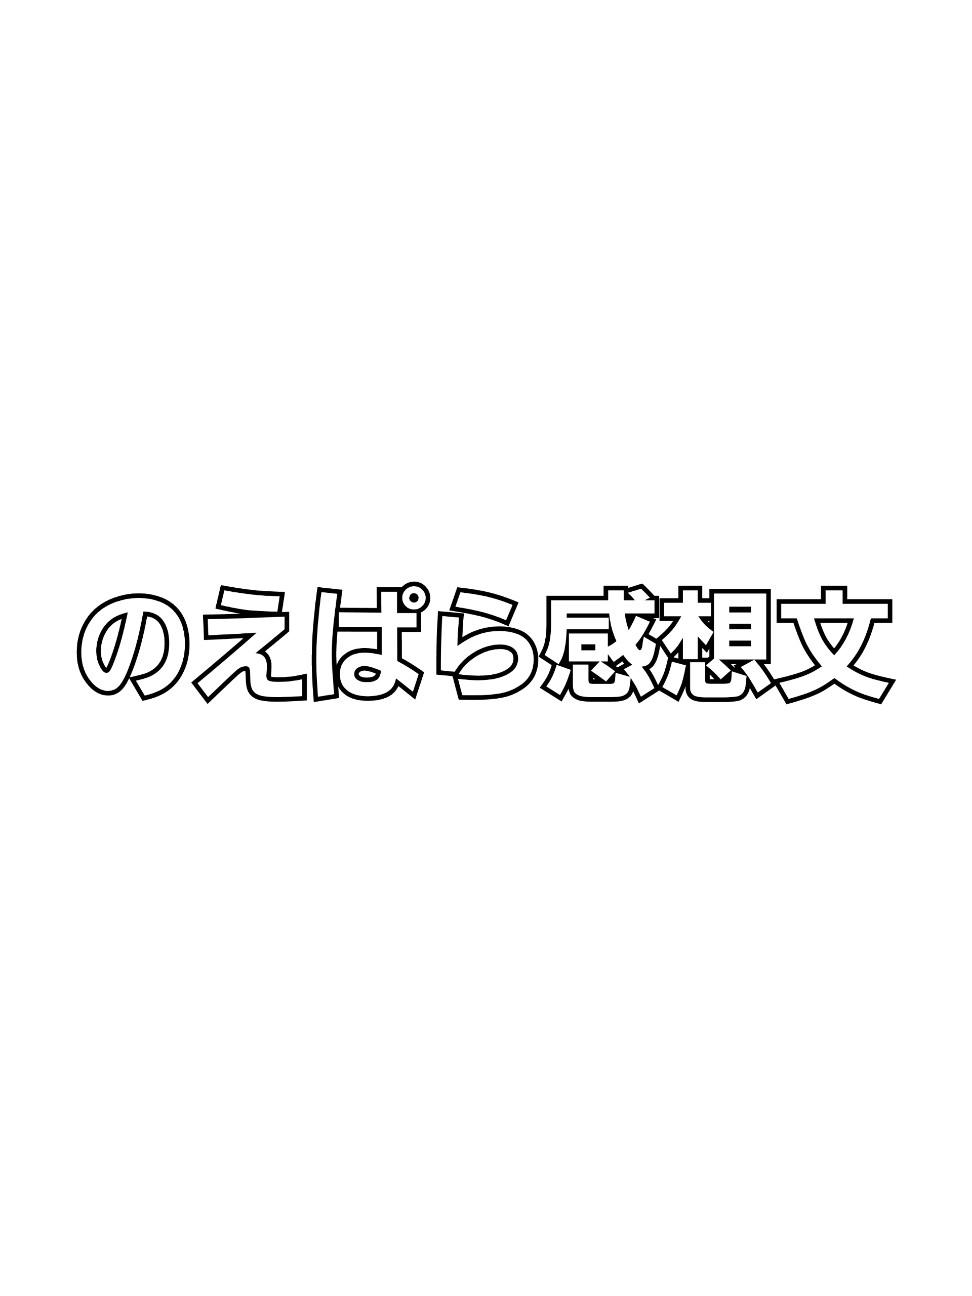 f:id:drgusnmii_sry:20200902193147j:image